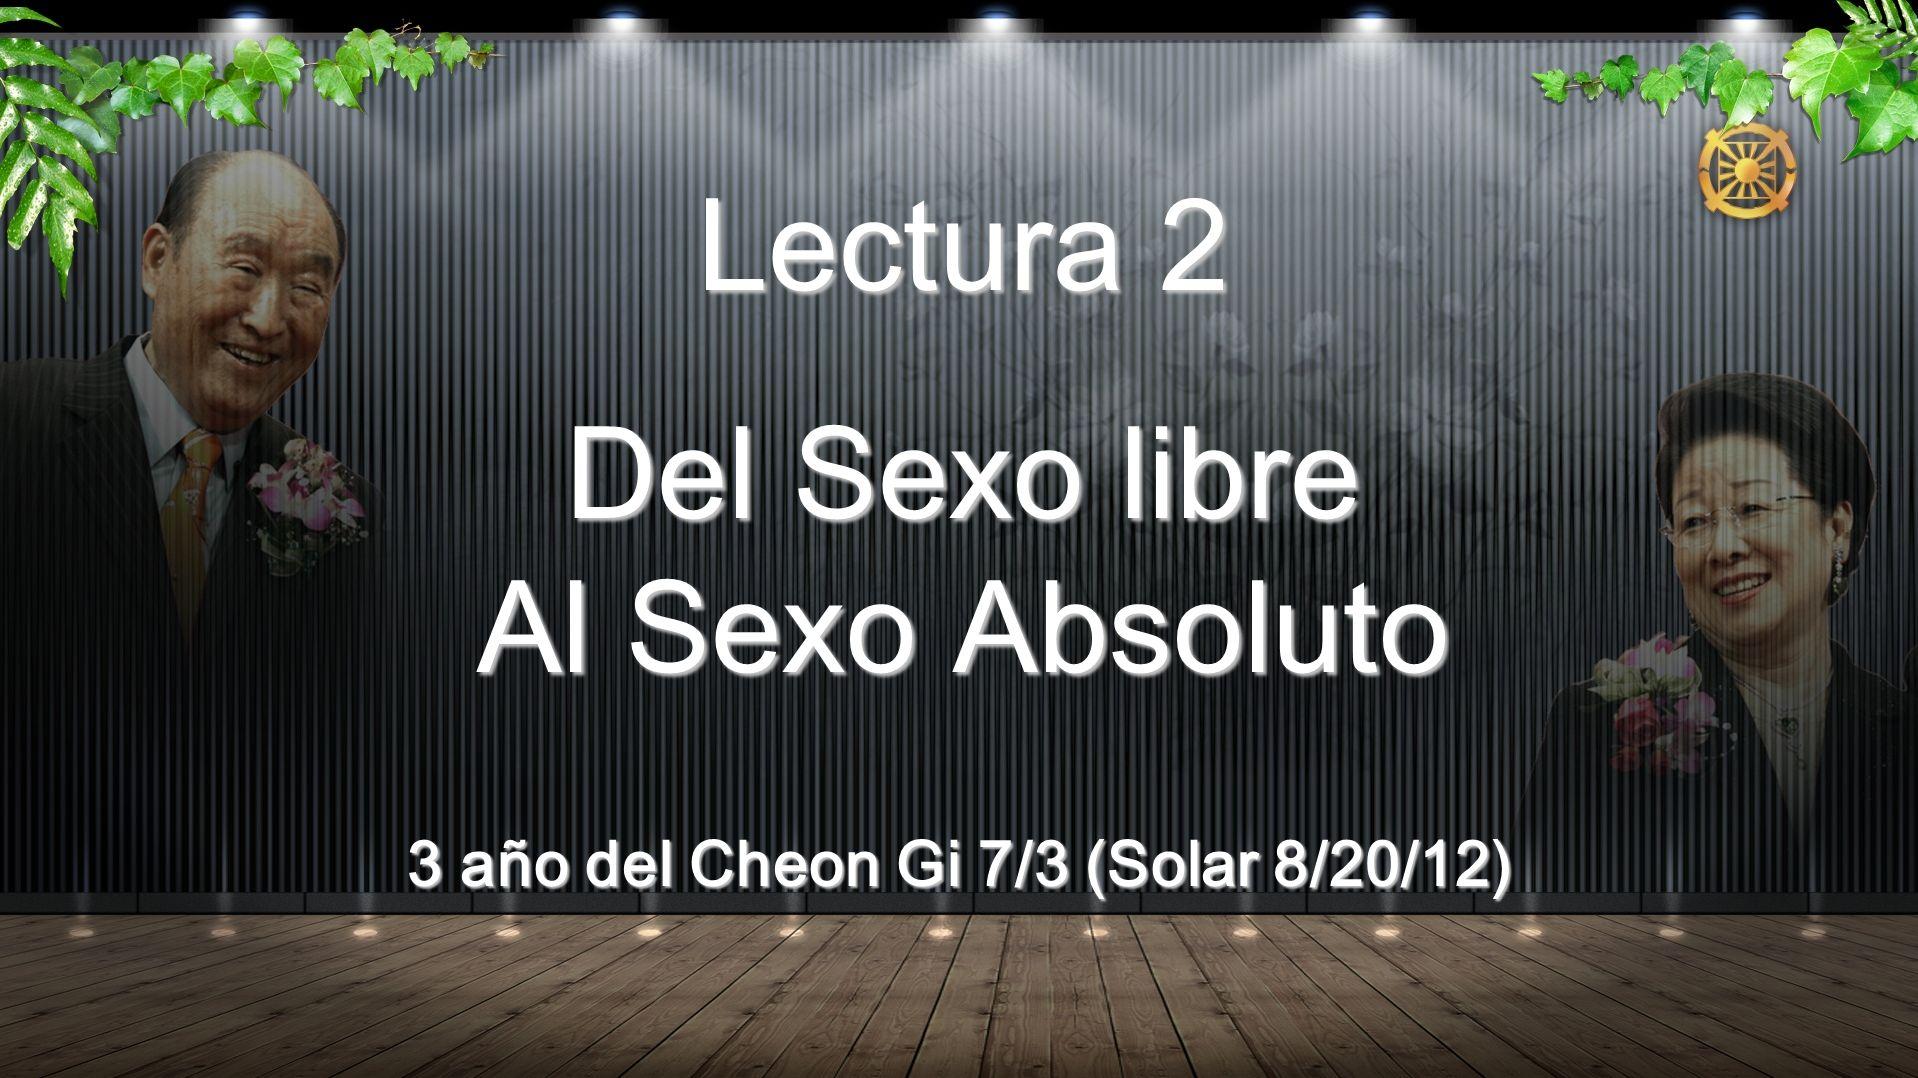 3 año del Cheon Gi 7/3 (Solar 8/20/12)